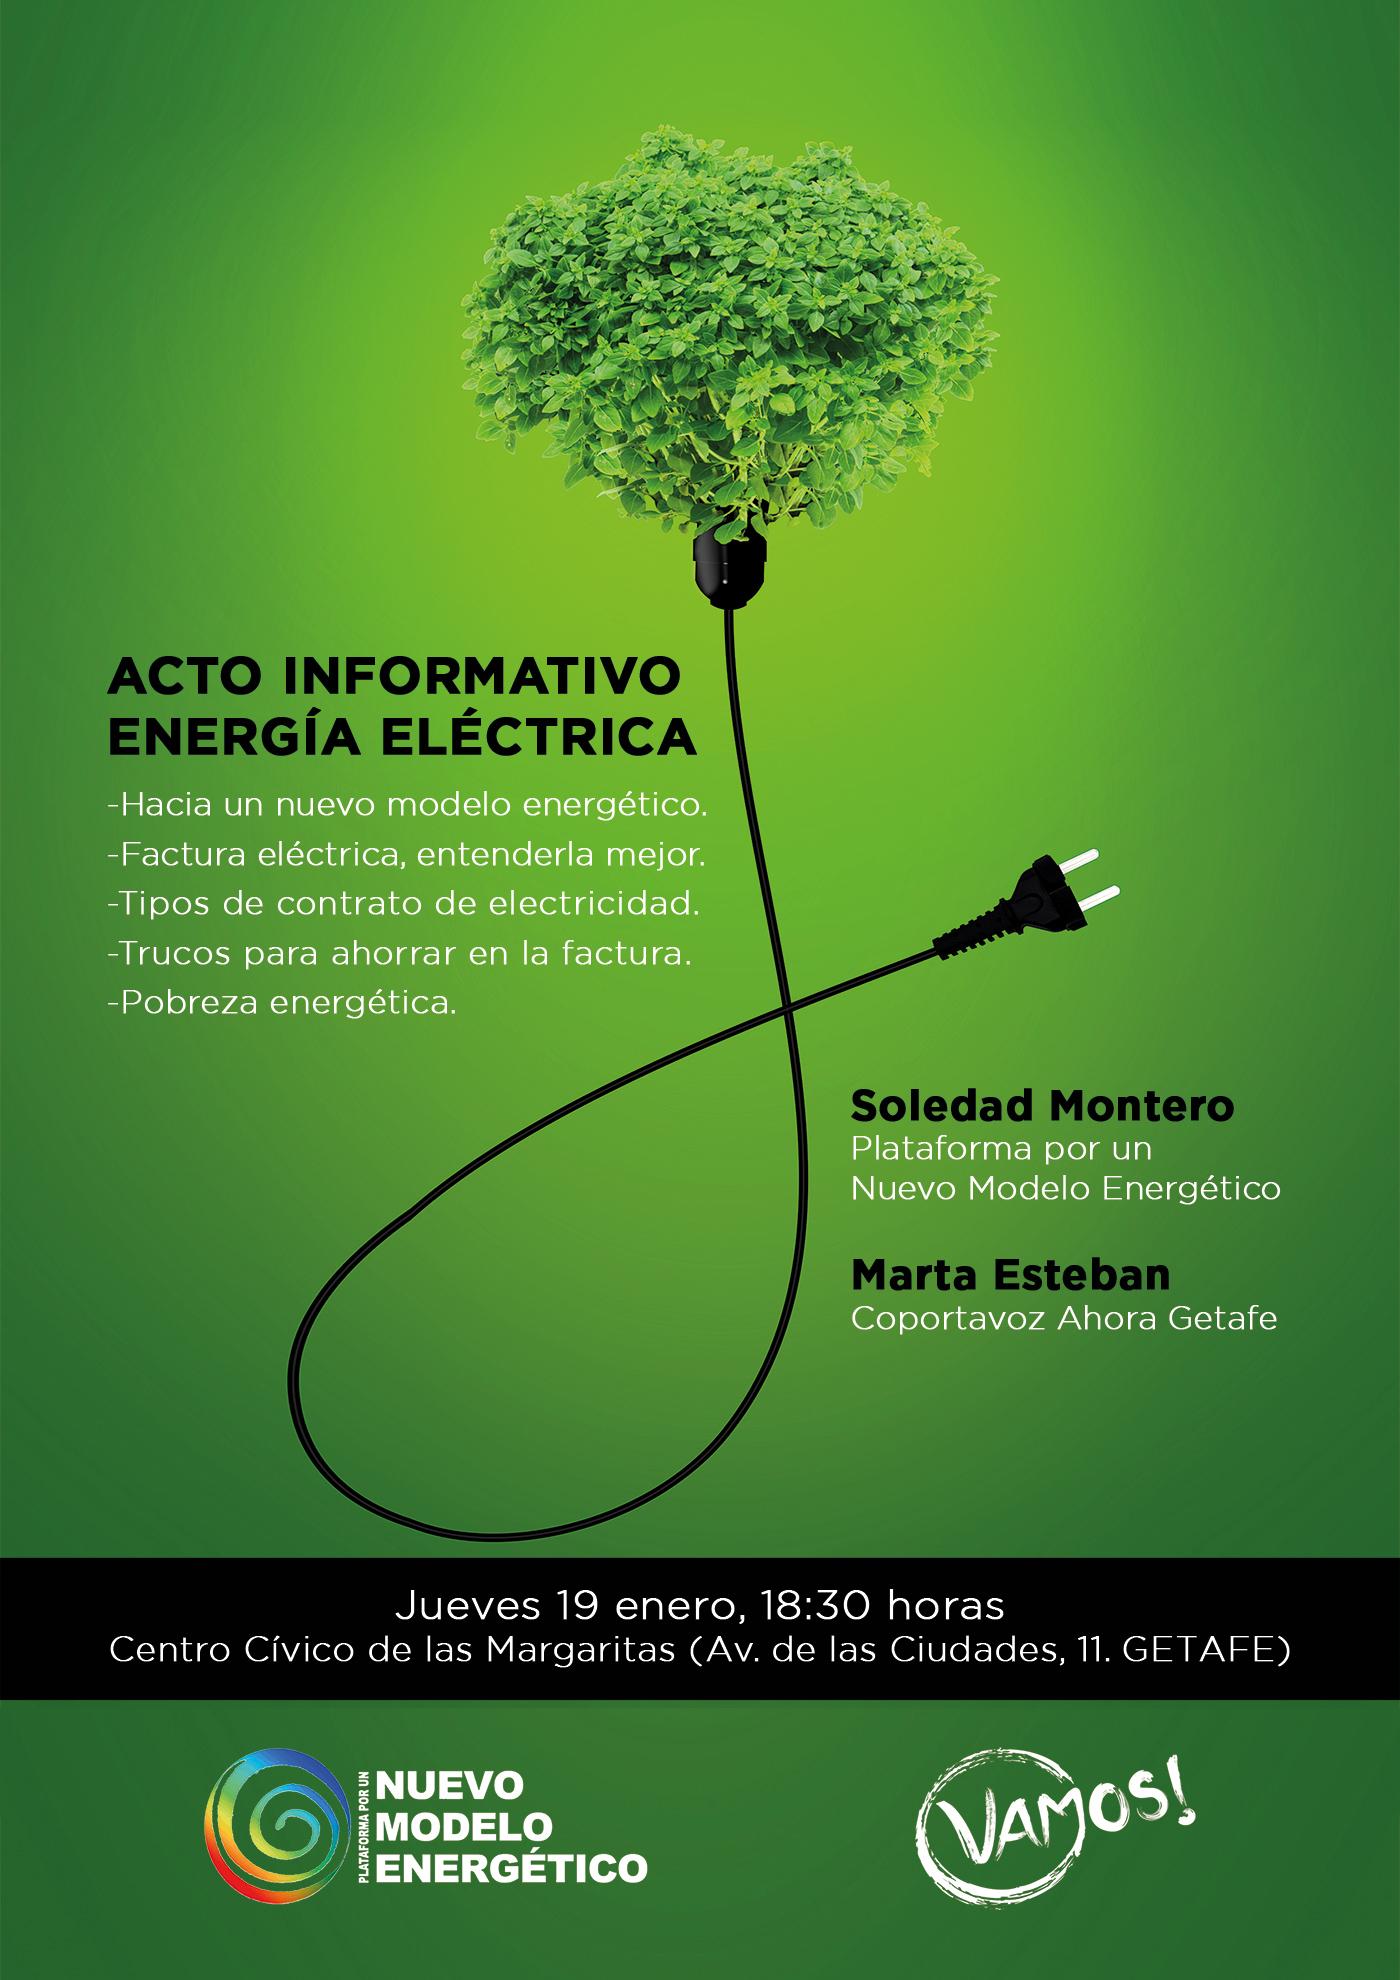 Cartlel charla pobreza energética